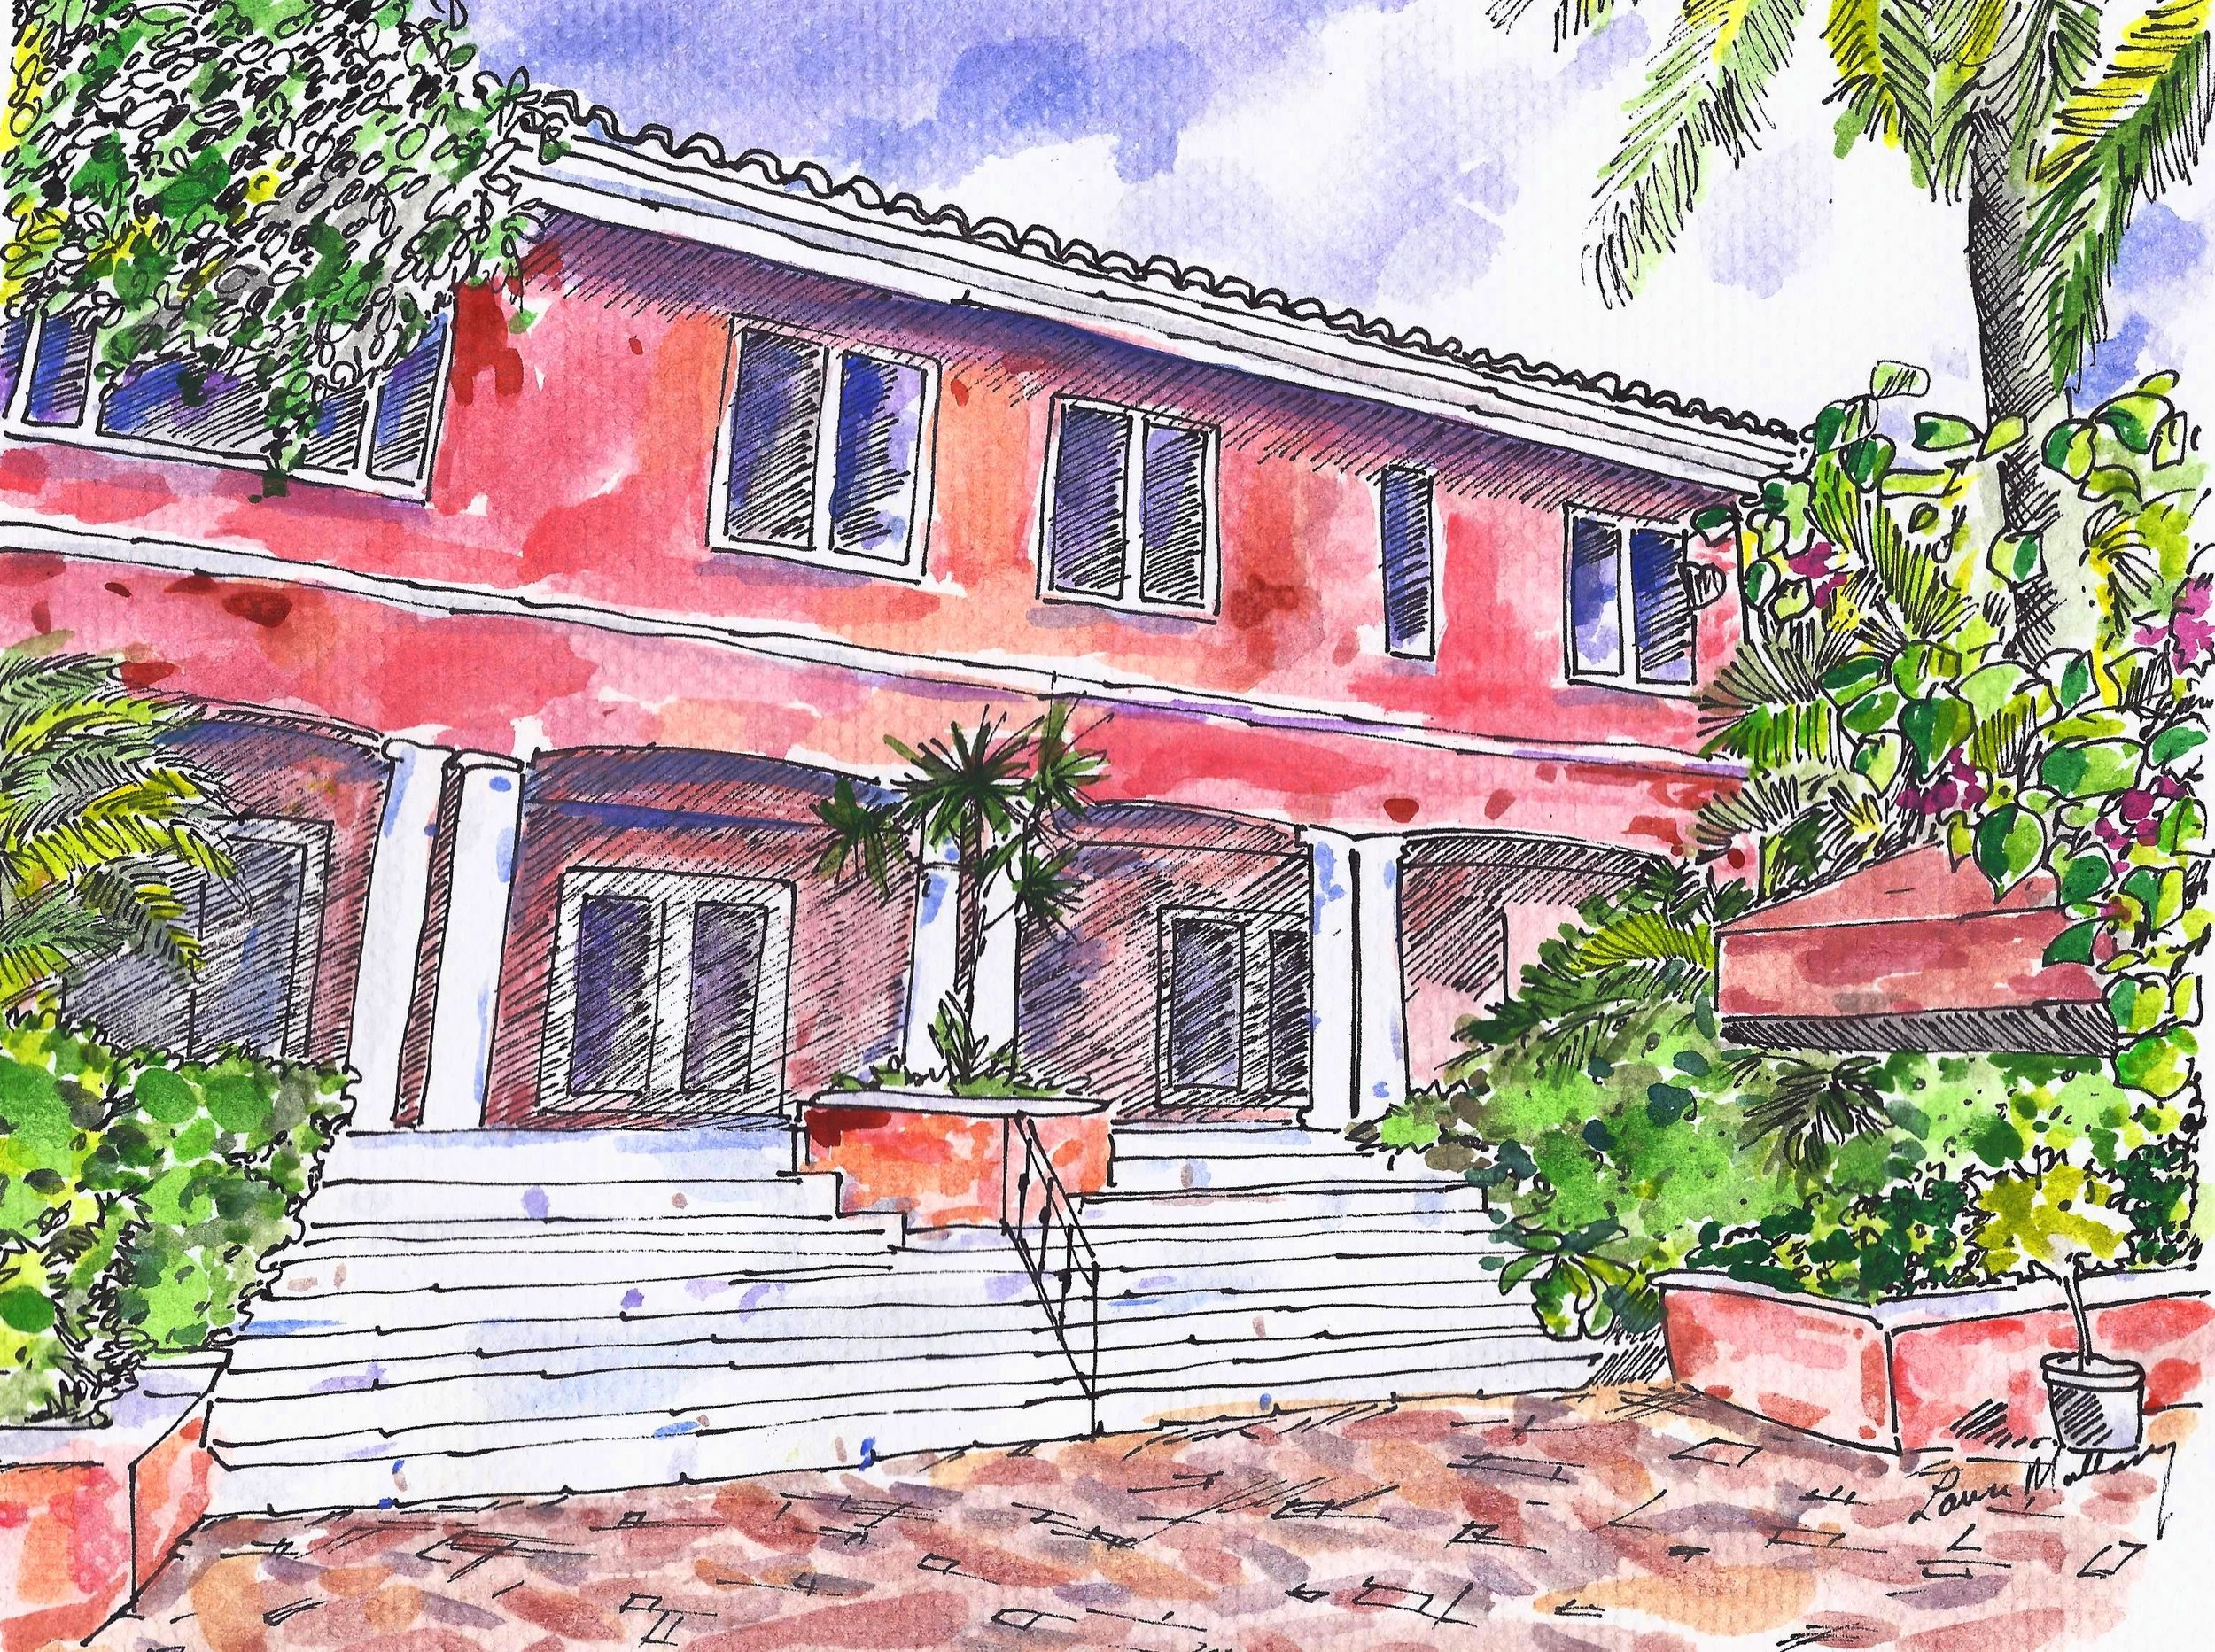 725 villabella avenue, coral gables